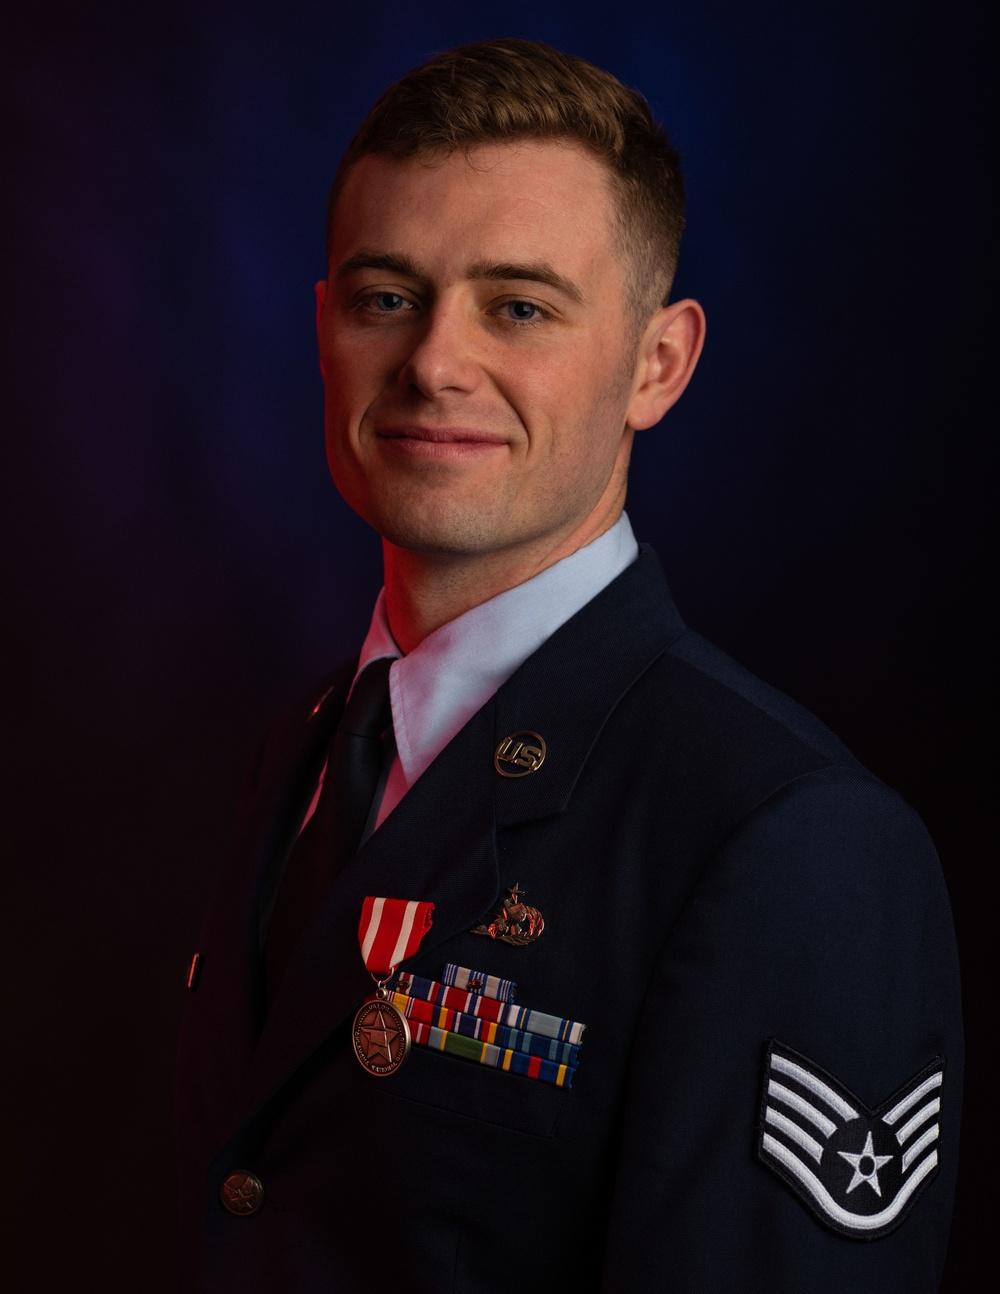 137th SOW Airman receives Oklahoma Star of Valor